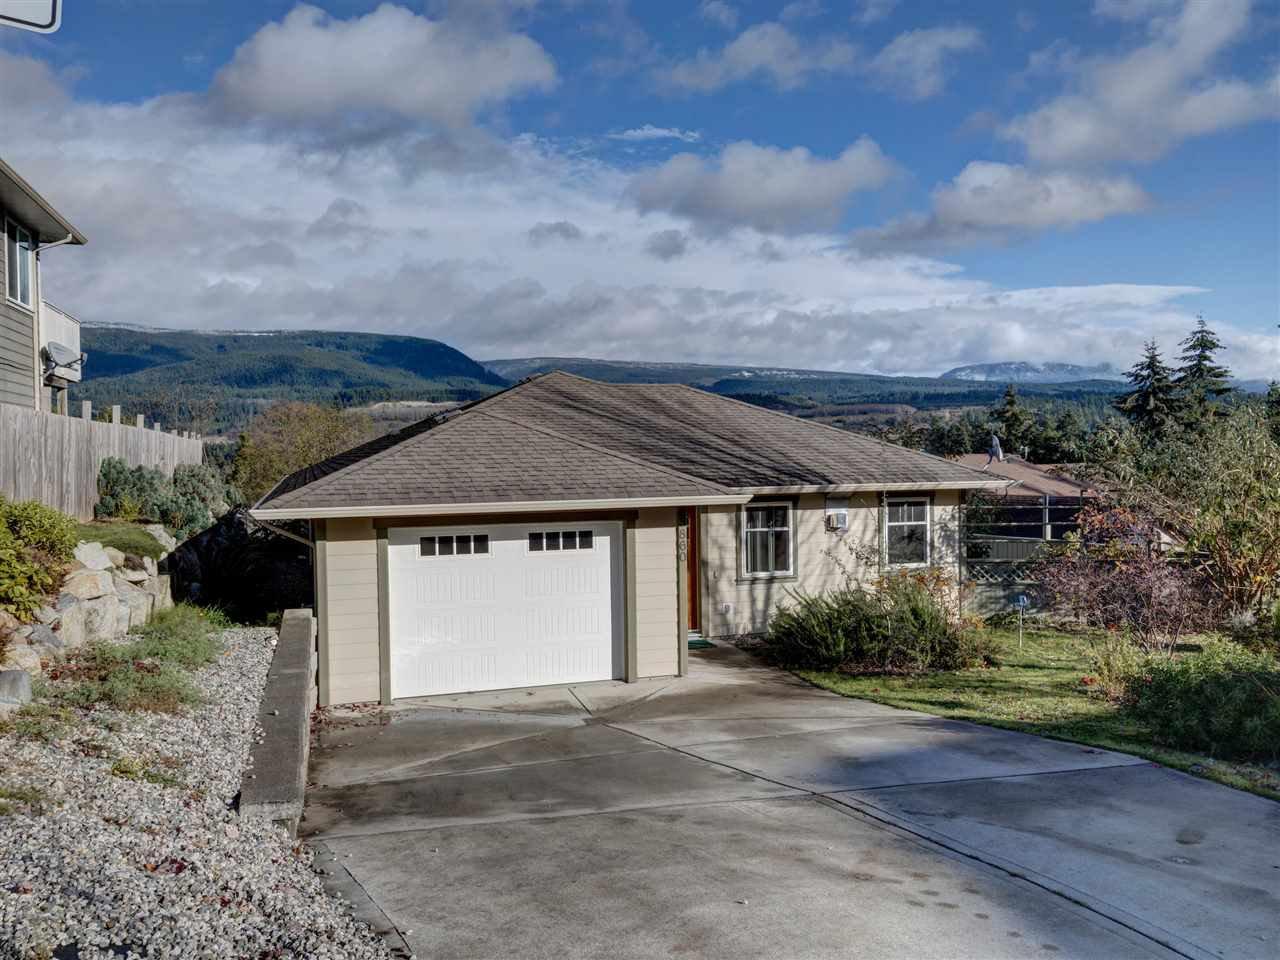 Main Photo: 5860 MEDUSA Street in Sechelt: Sechelt District House for sale (Sunshine Coast)  : MLS®# R2515941